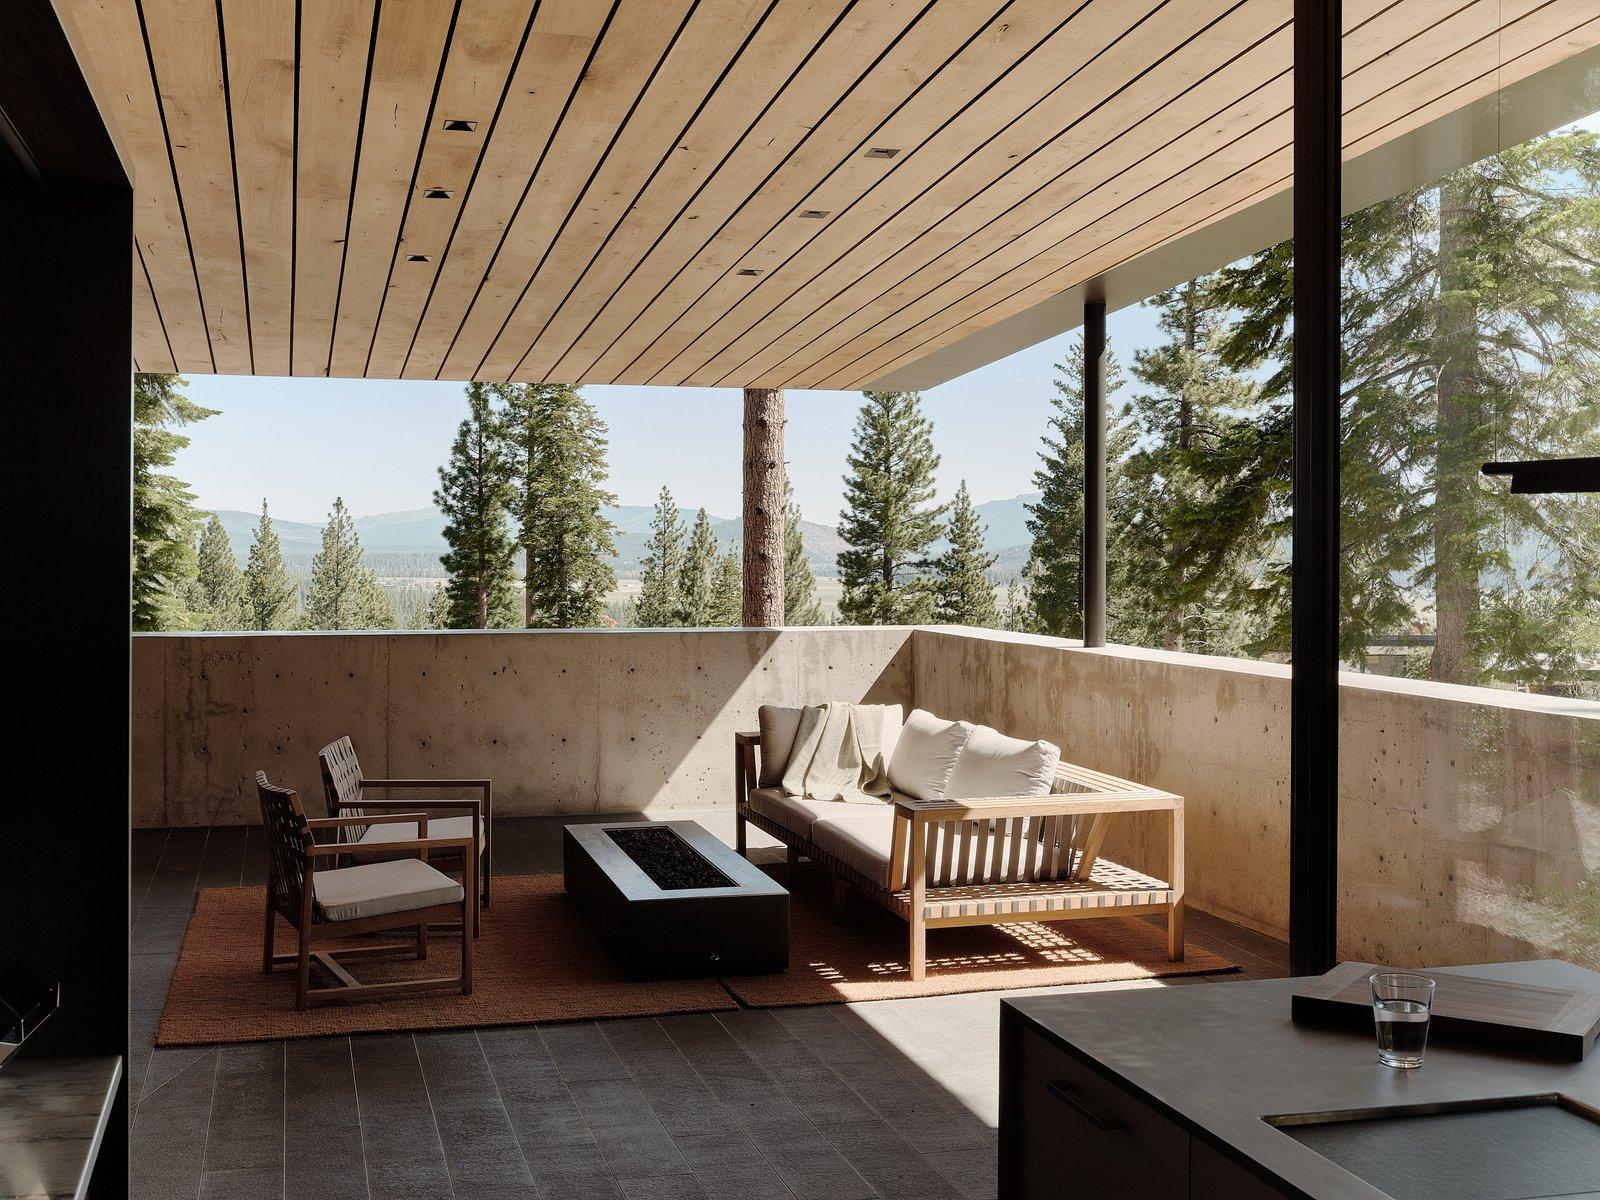 Lookout House terrace